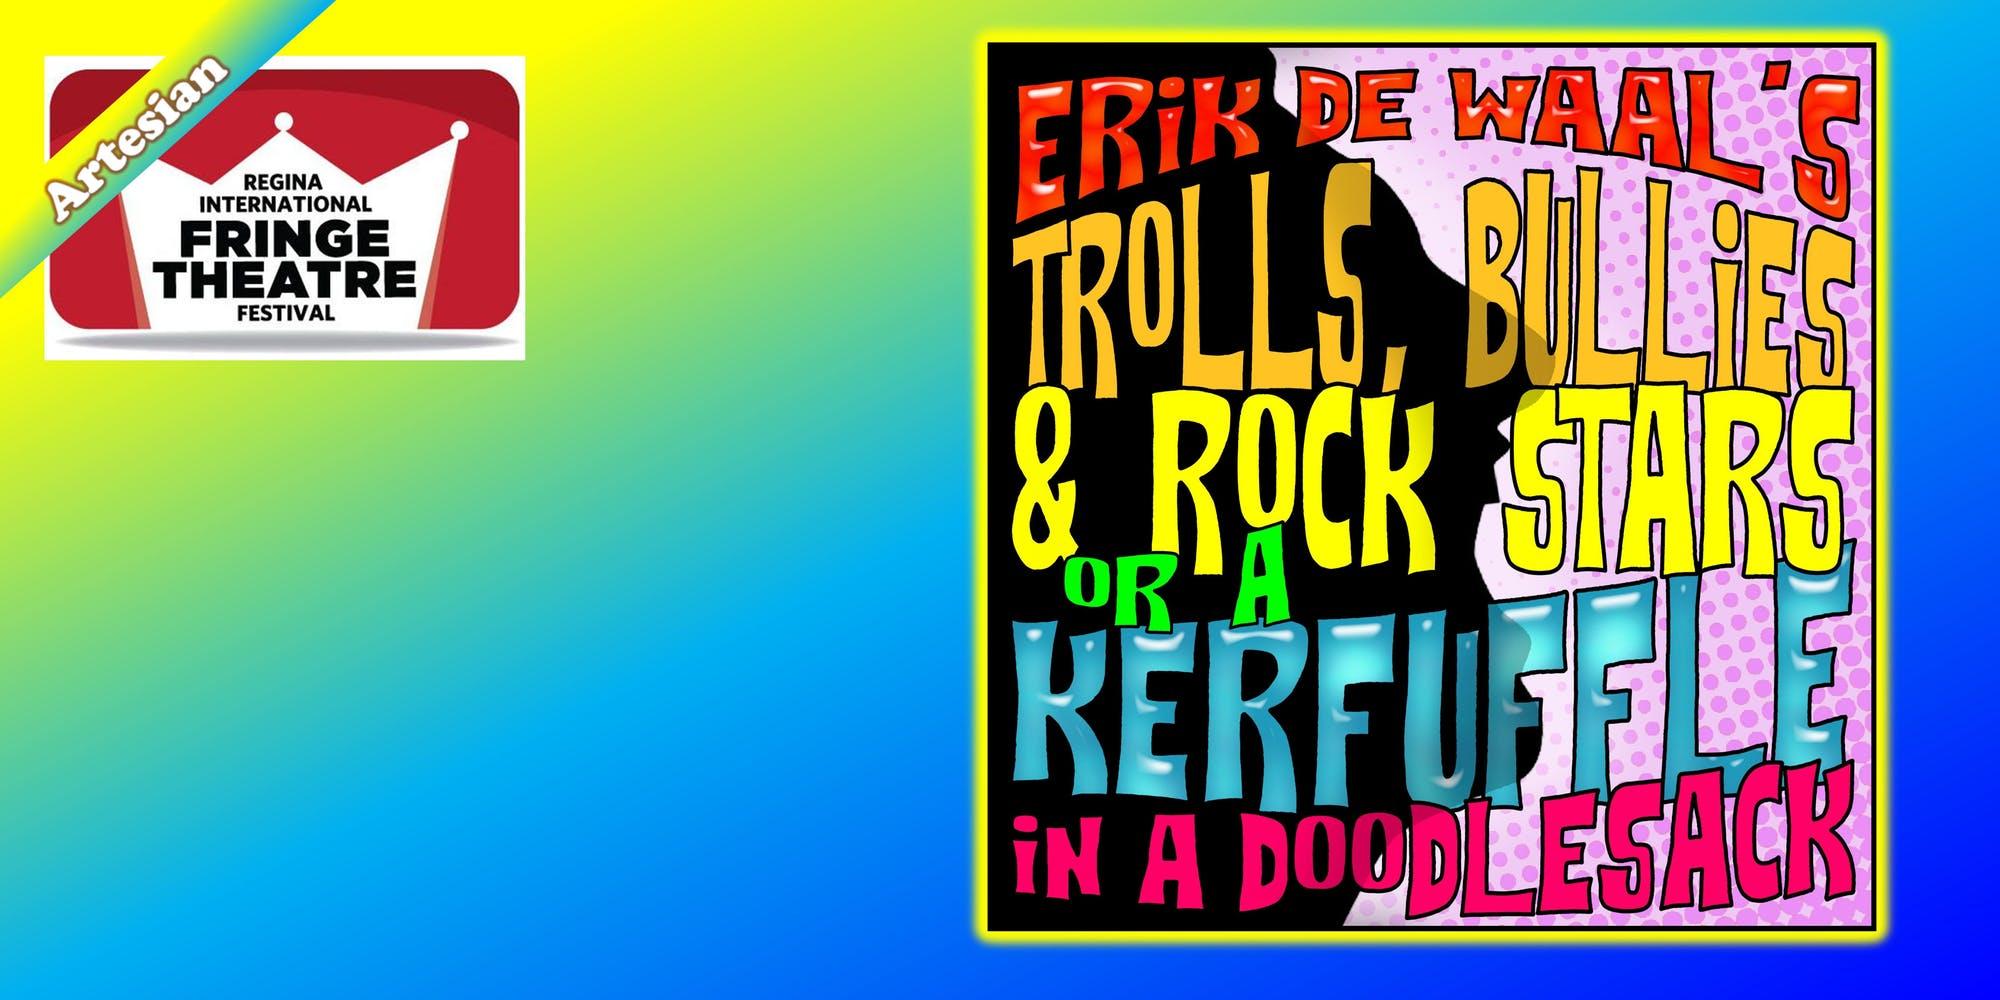 Erik de Waal's TROLLS, BULLIES, & ROCK STARTS or A Kerfuffle in a Doodlesack - Regina International Fringe Theatre Festival